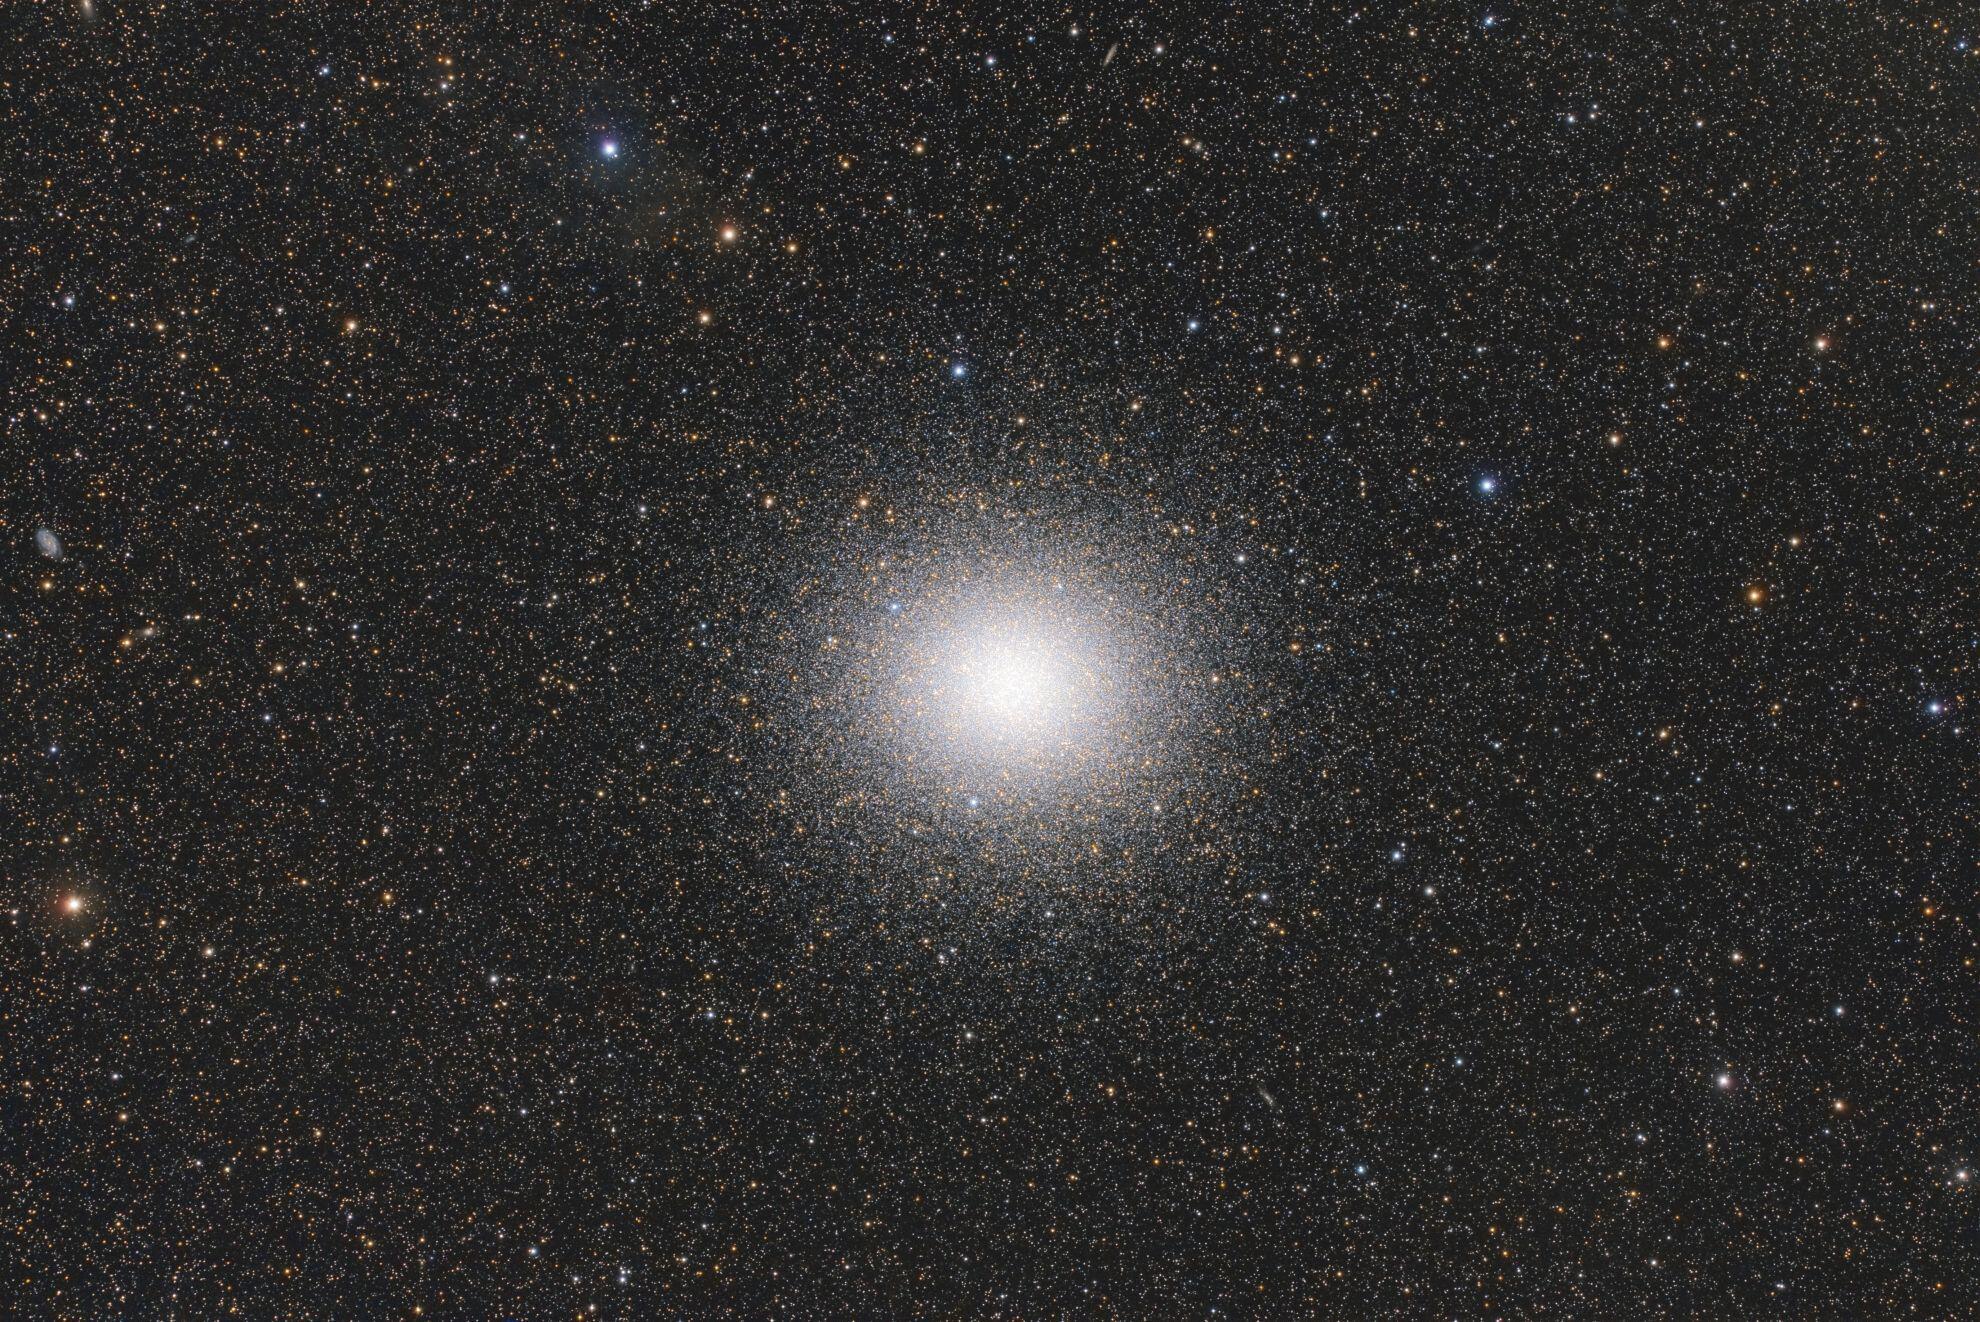 Bild zu Ignacio Diaz Bobillo (Argentina) with The Magnificent Omega Centauri